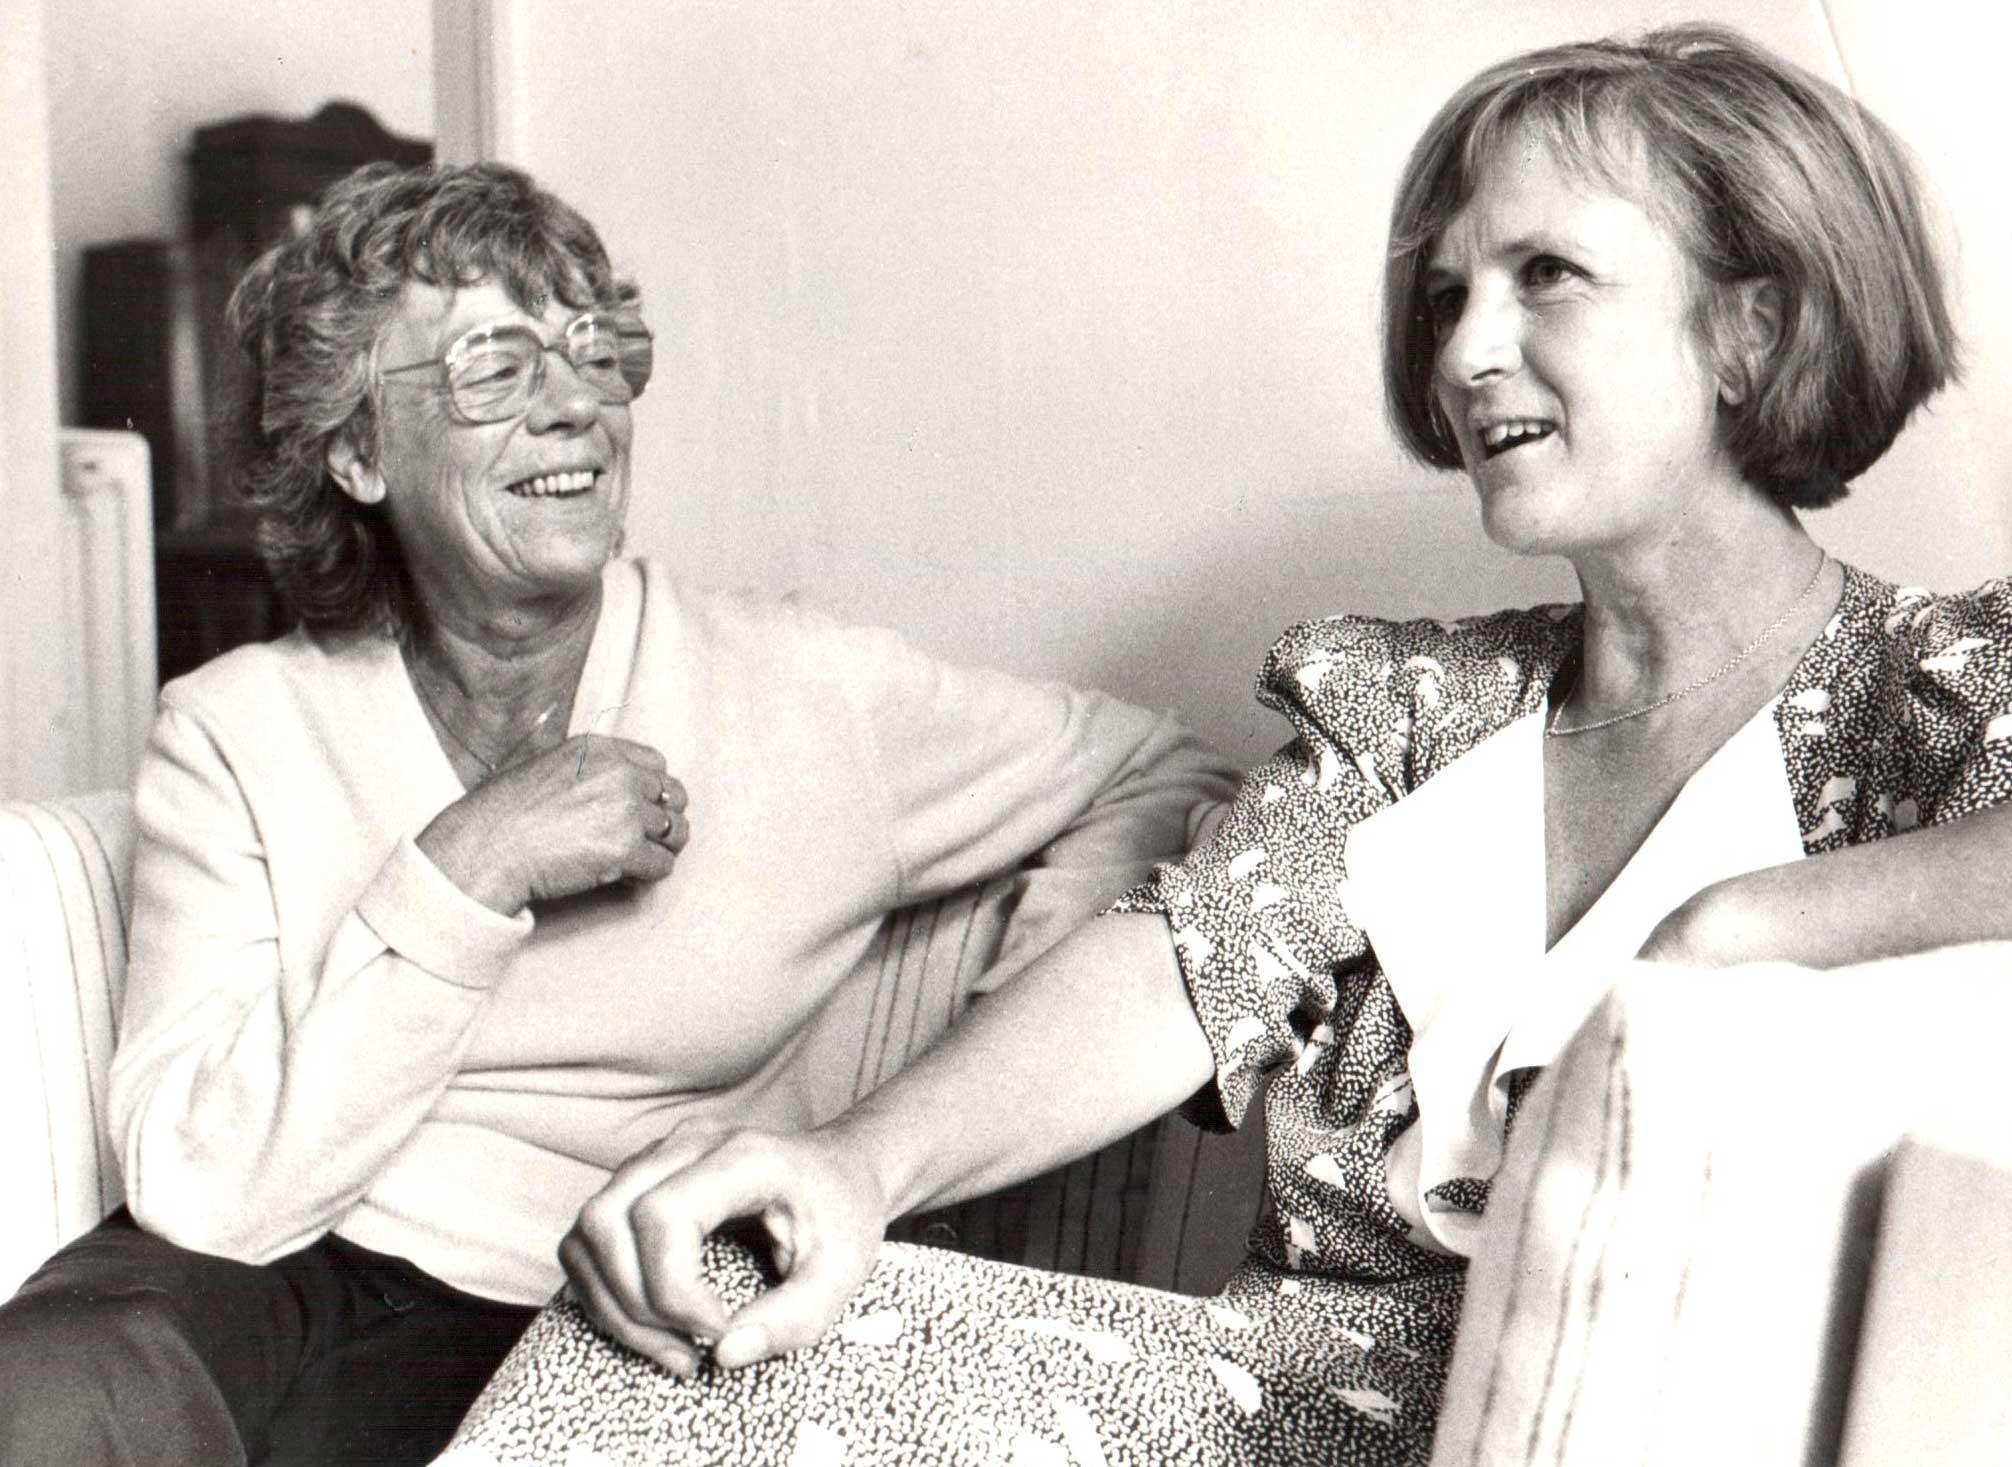 Pil Dahlerup og journalist Annelise Vestergaard 1987, foto Mik Eskestad